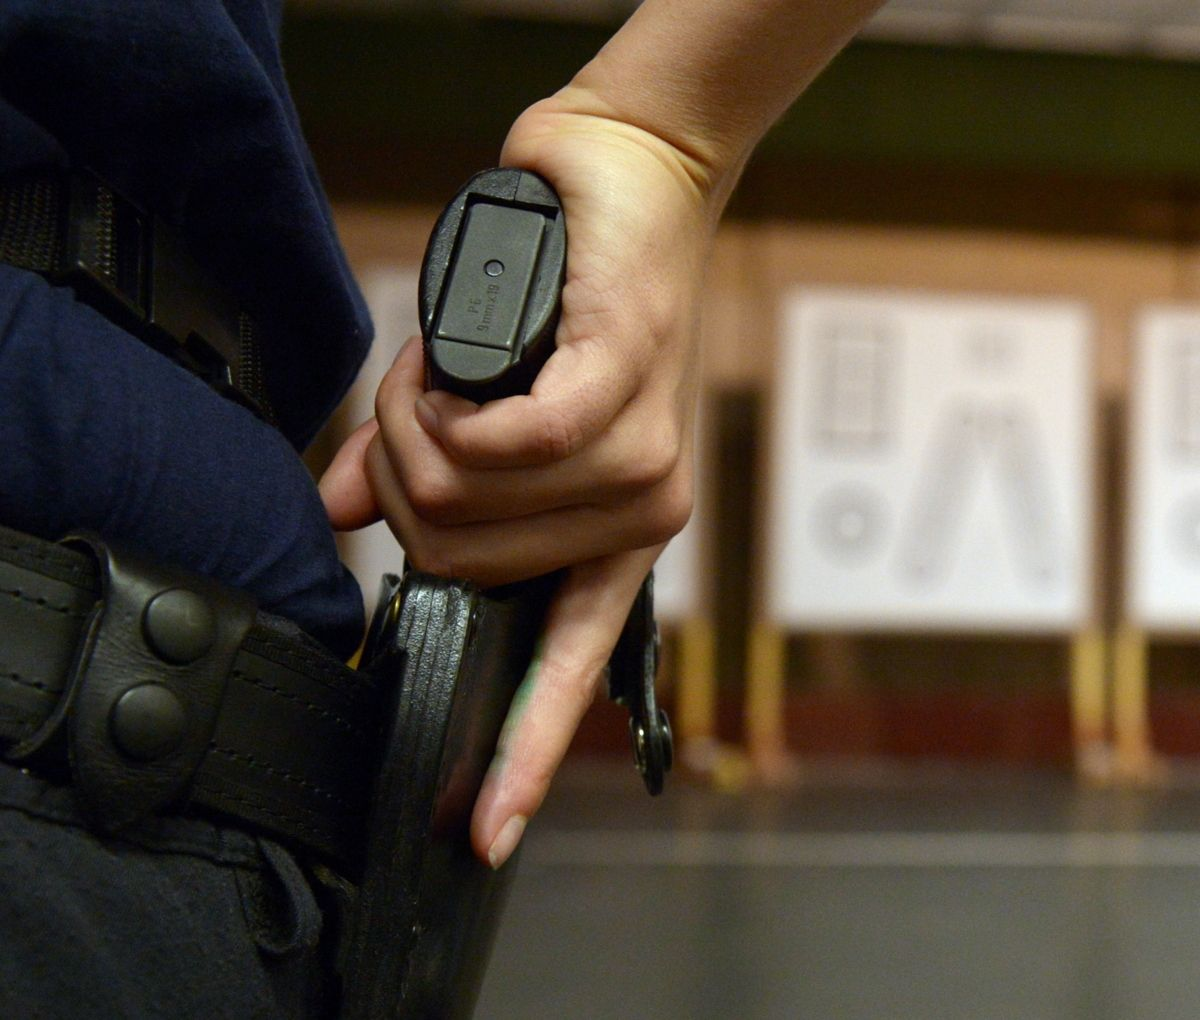 Pistole Polizei Dpa Rainer Jensen